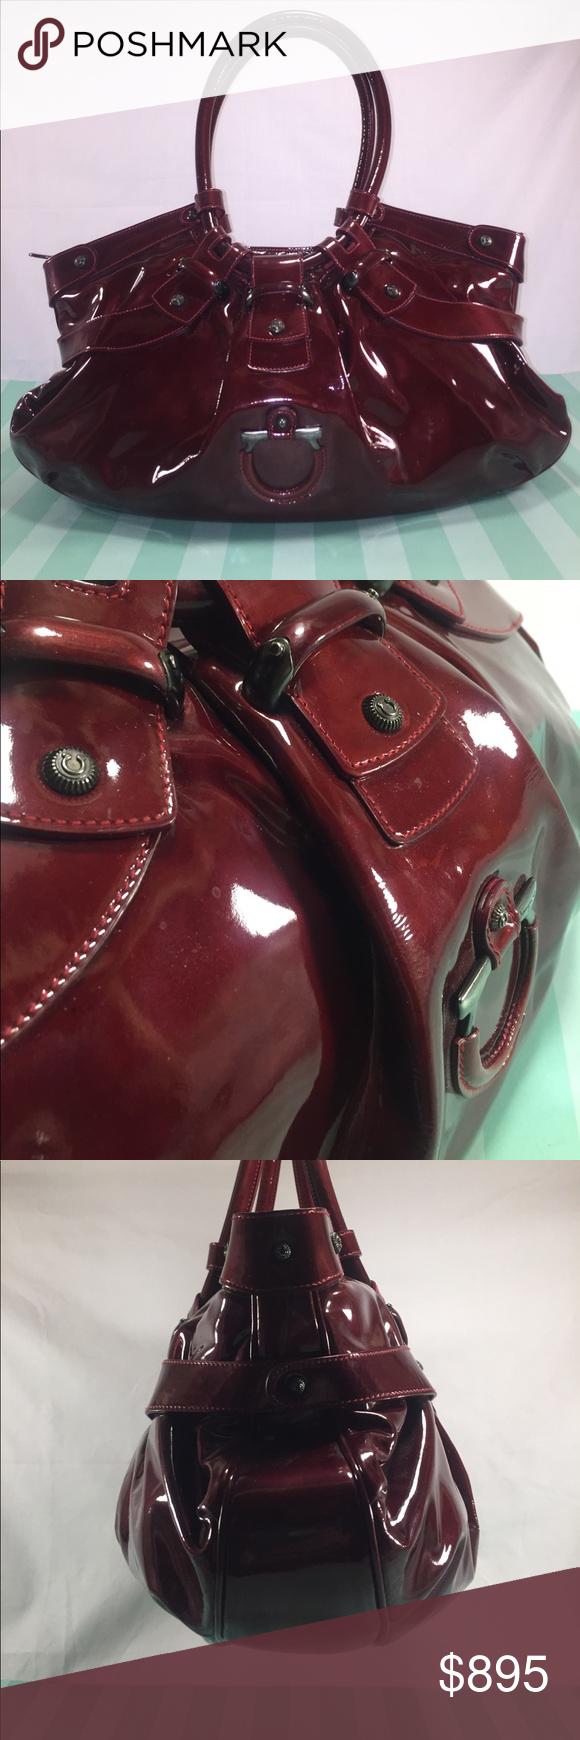 ec6d77fe87 SALVATORE FERRAGAMO Authentic Celtic Satchel SALVATORE FERRAGAMO Authentic  Celtic Satchel in burgundy red patent calfskin w